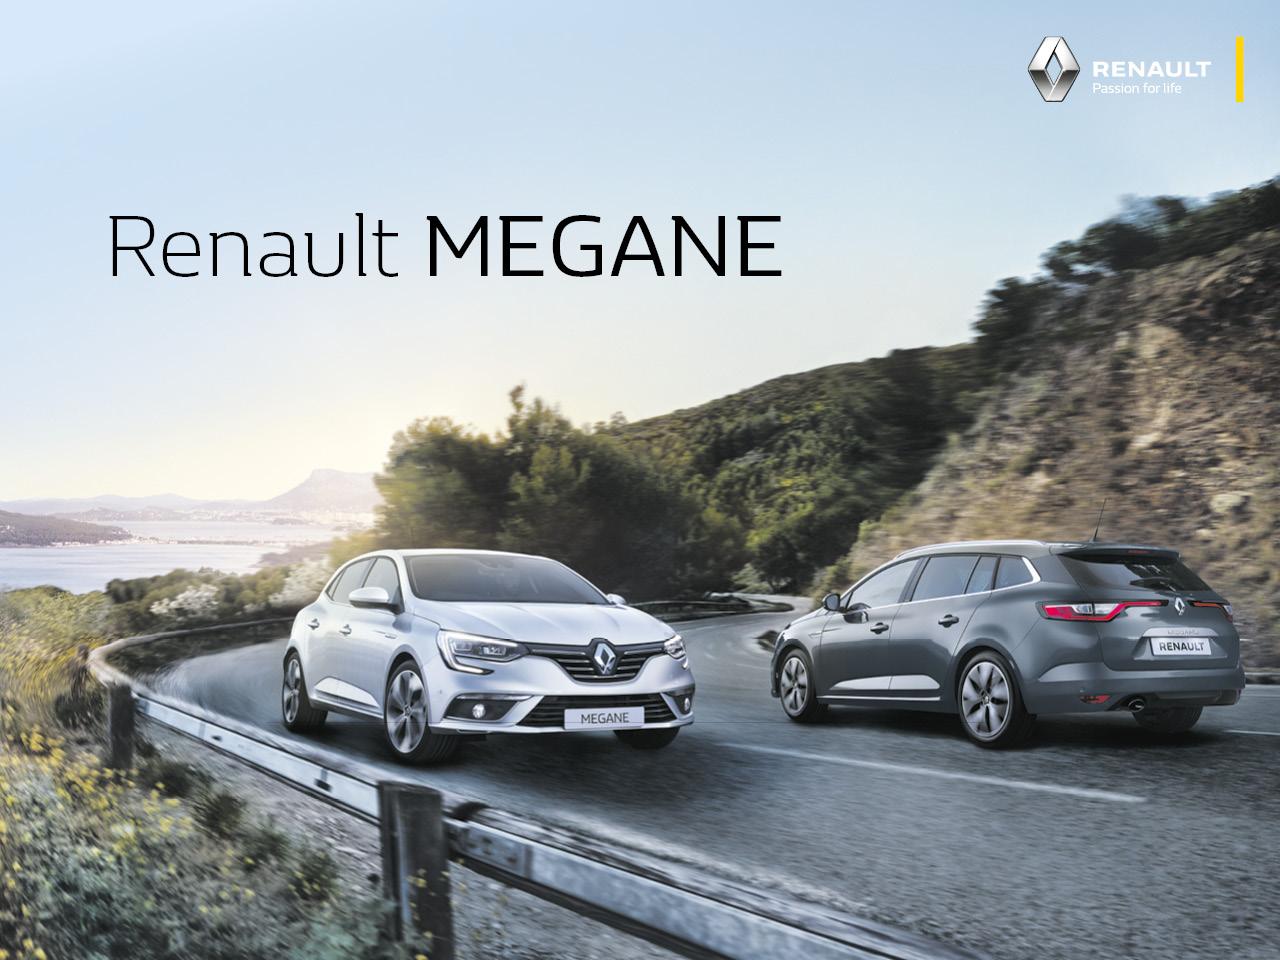 Renault Megane etuhintaan